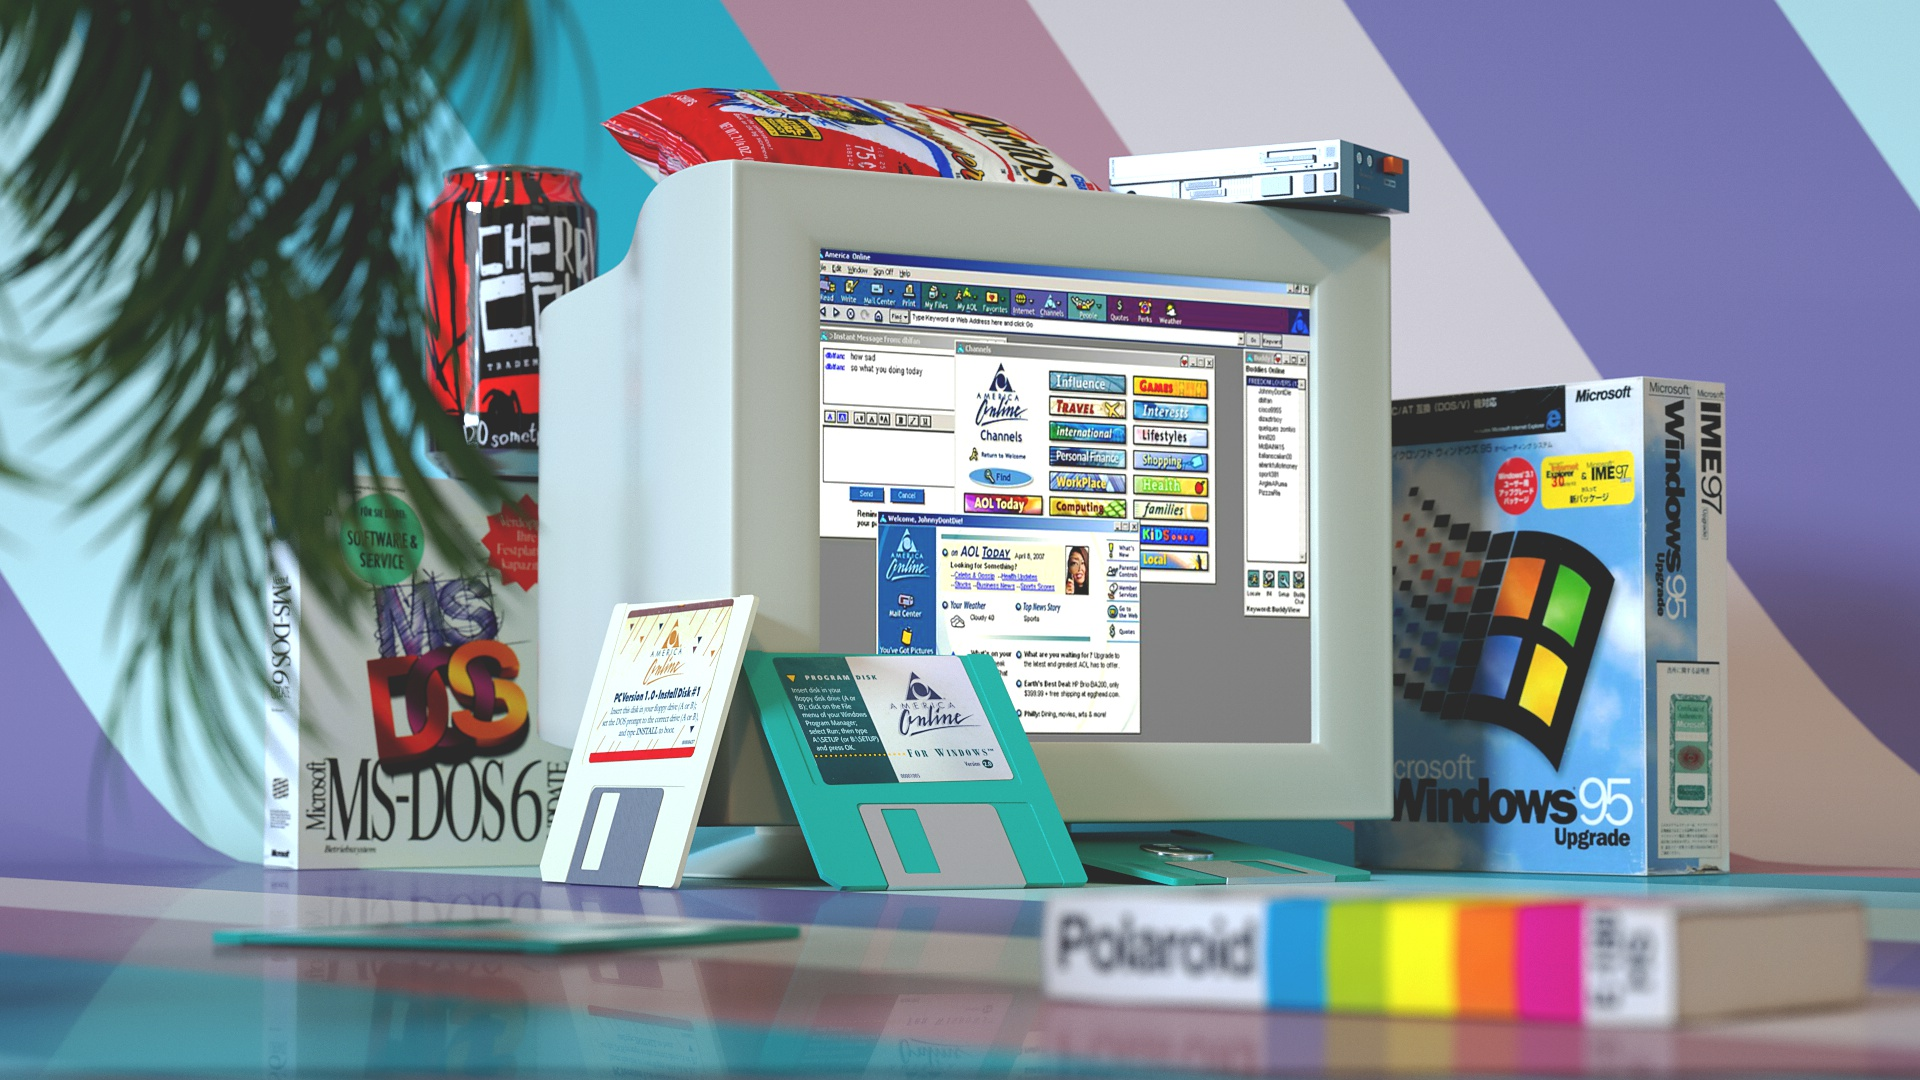 General 1920x1080 vintage technology computer monitor Microsoft Windows Windows 95 MS-DOS floppy disk VHS cherry coke nostalgia CRT